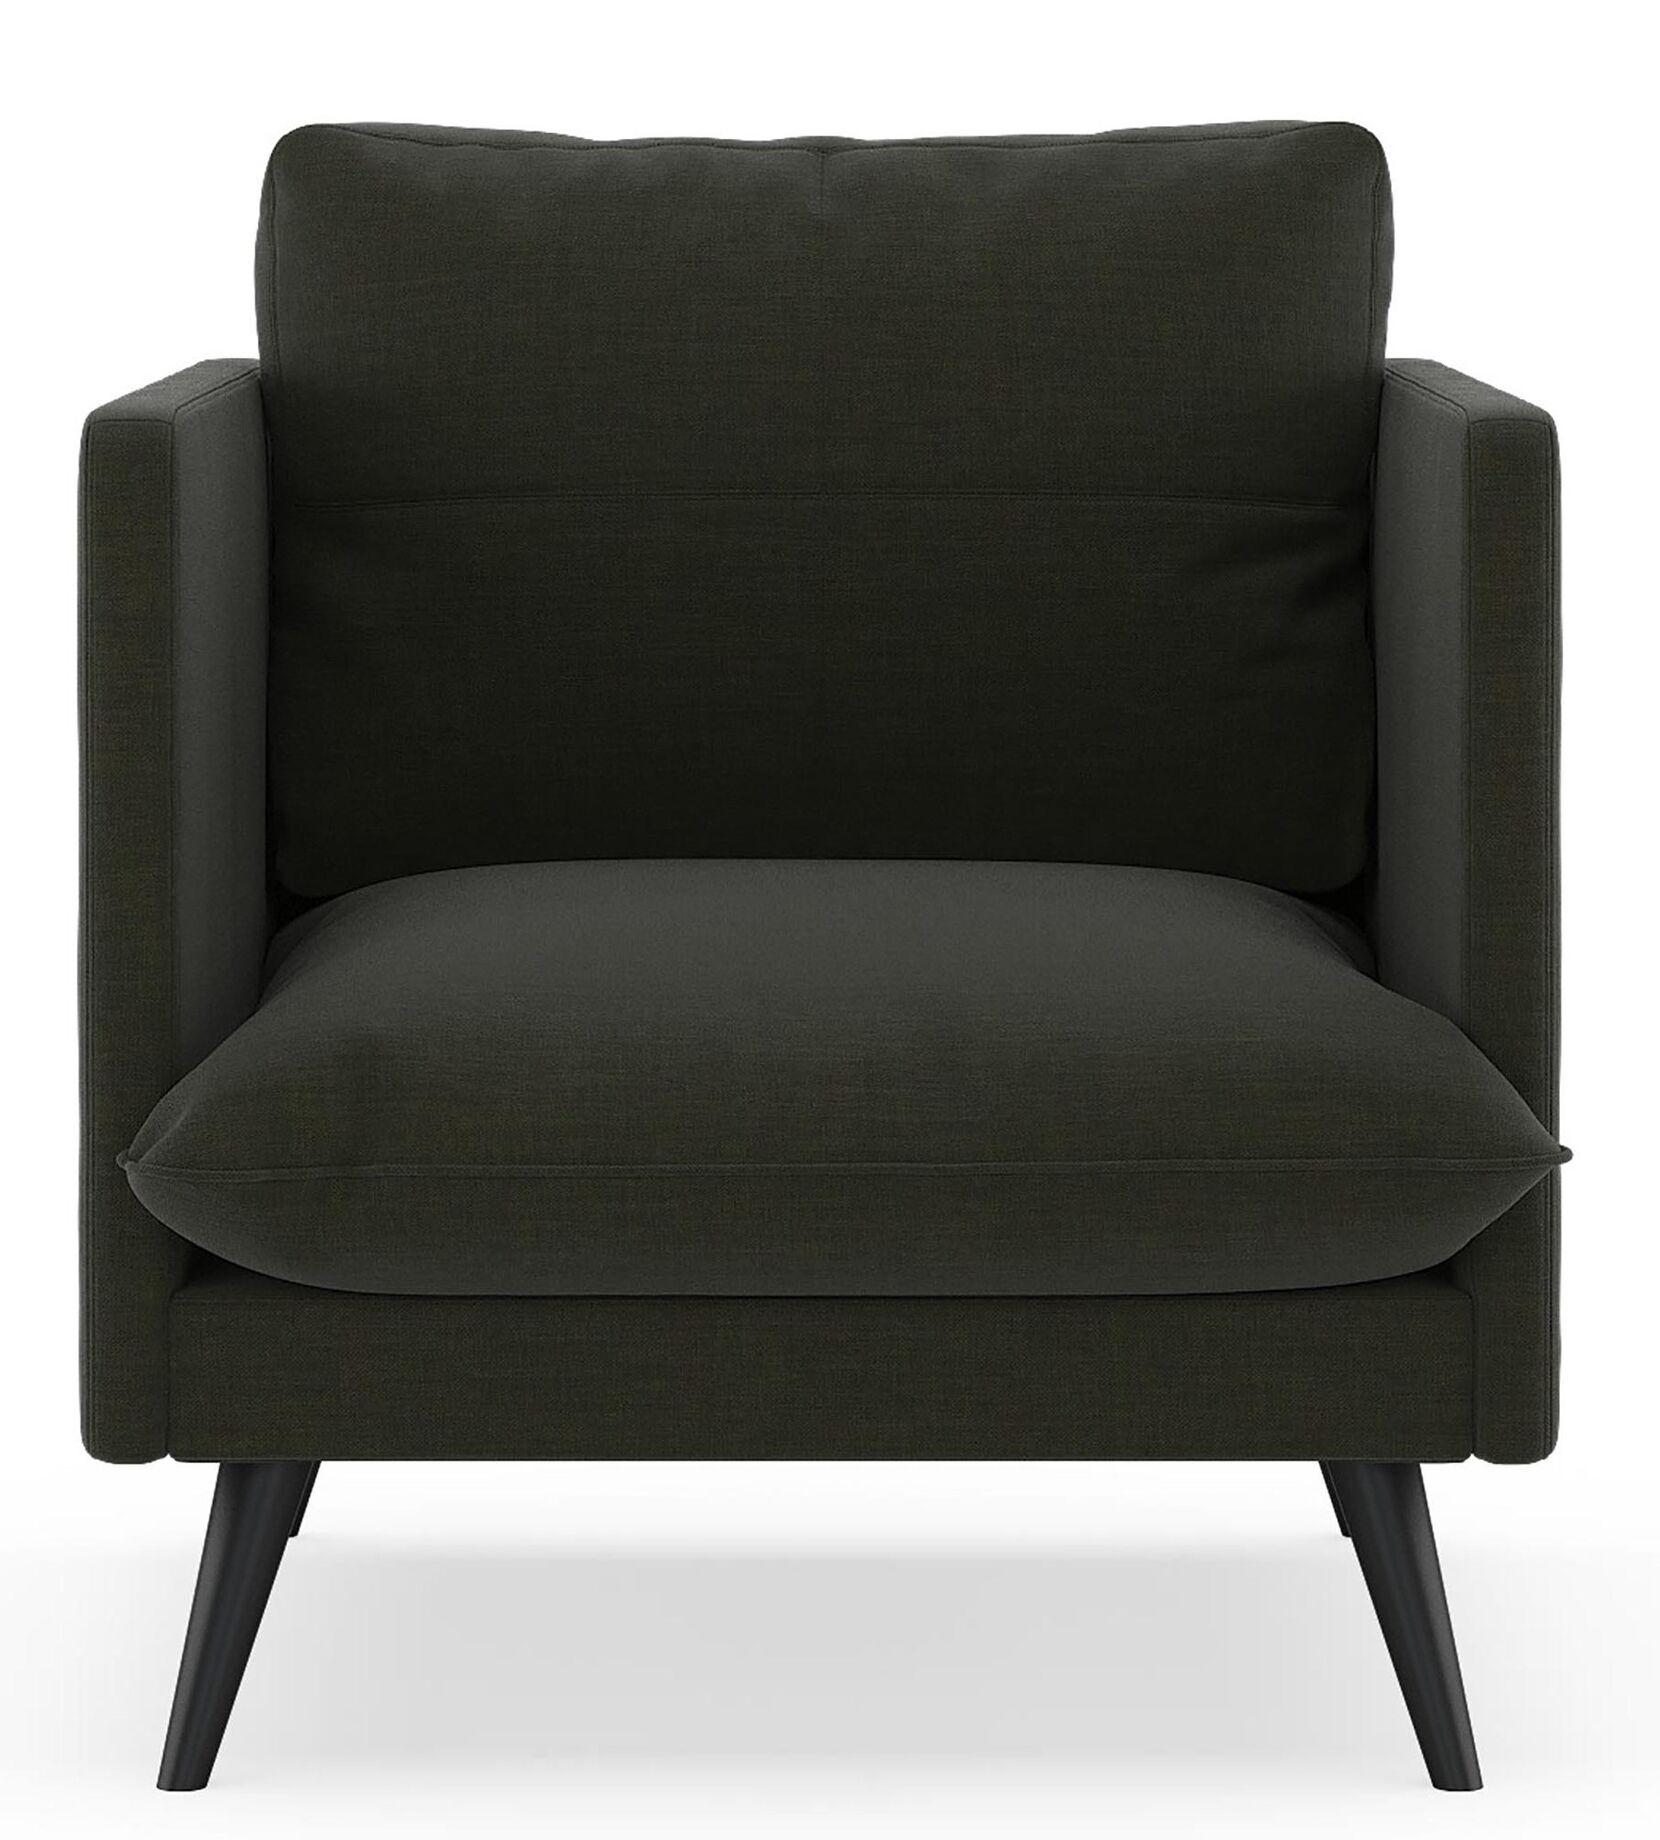 Labounty Armchair Upholstery: Stone Blue, Finish: Brass